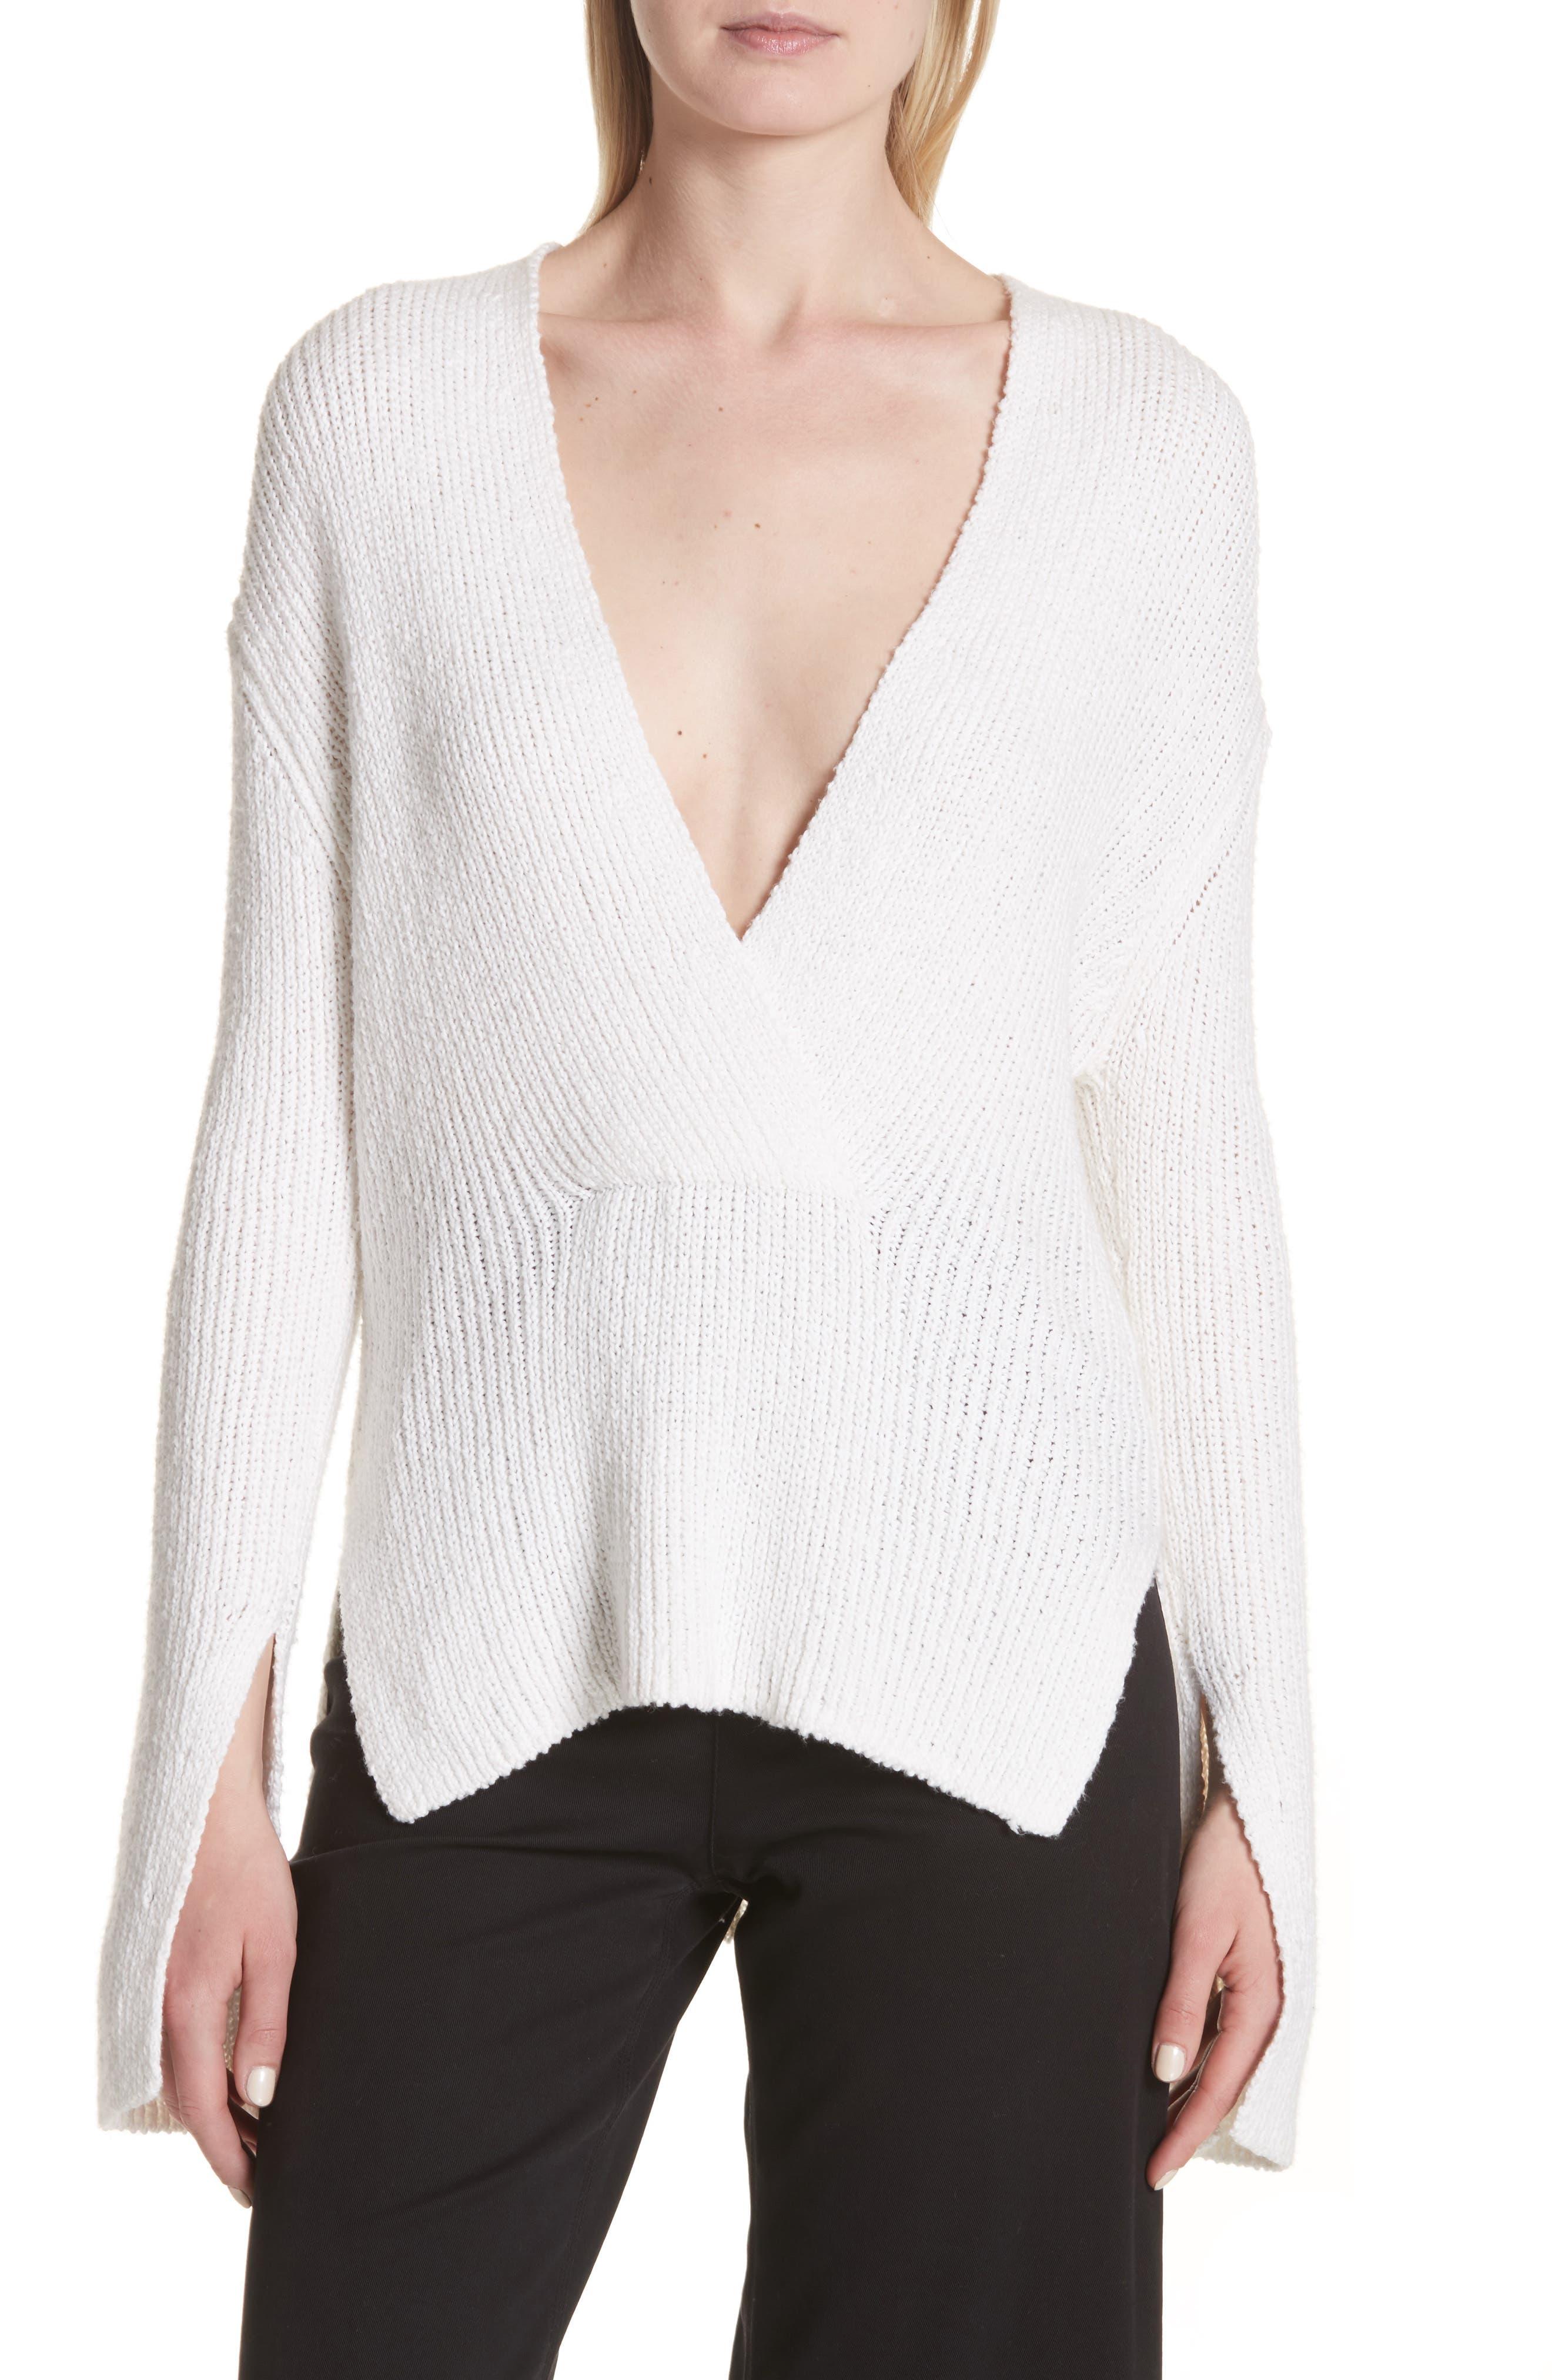 Nick Cotton Sweater,                             Main thumbnail 1, color,                             White